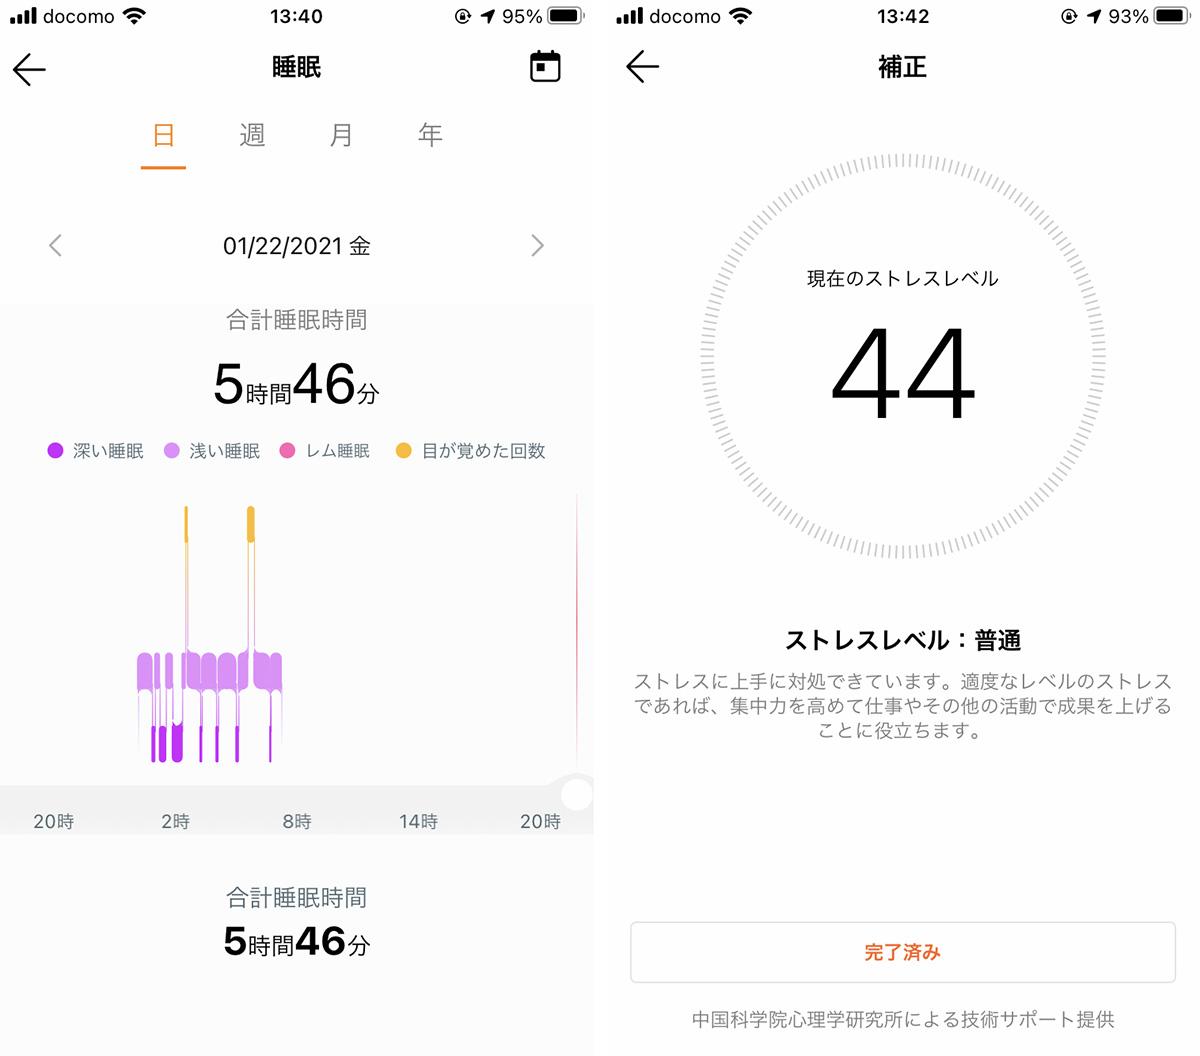 HUAWEI WATCH GT 2 Proのアプリ画面画像